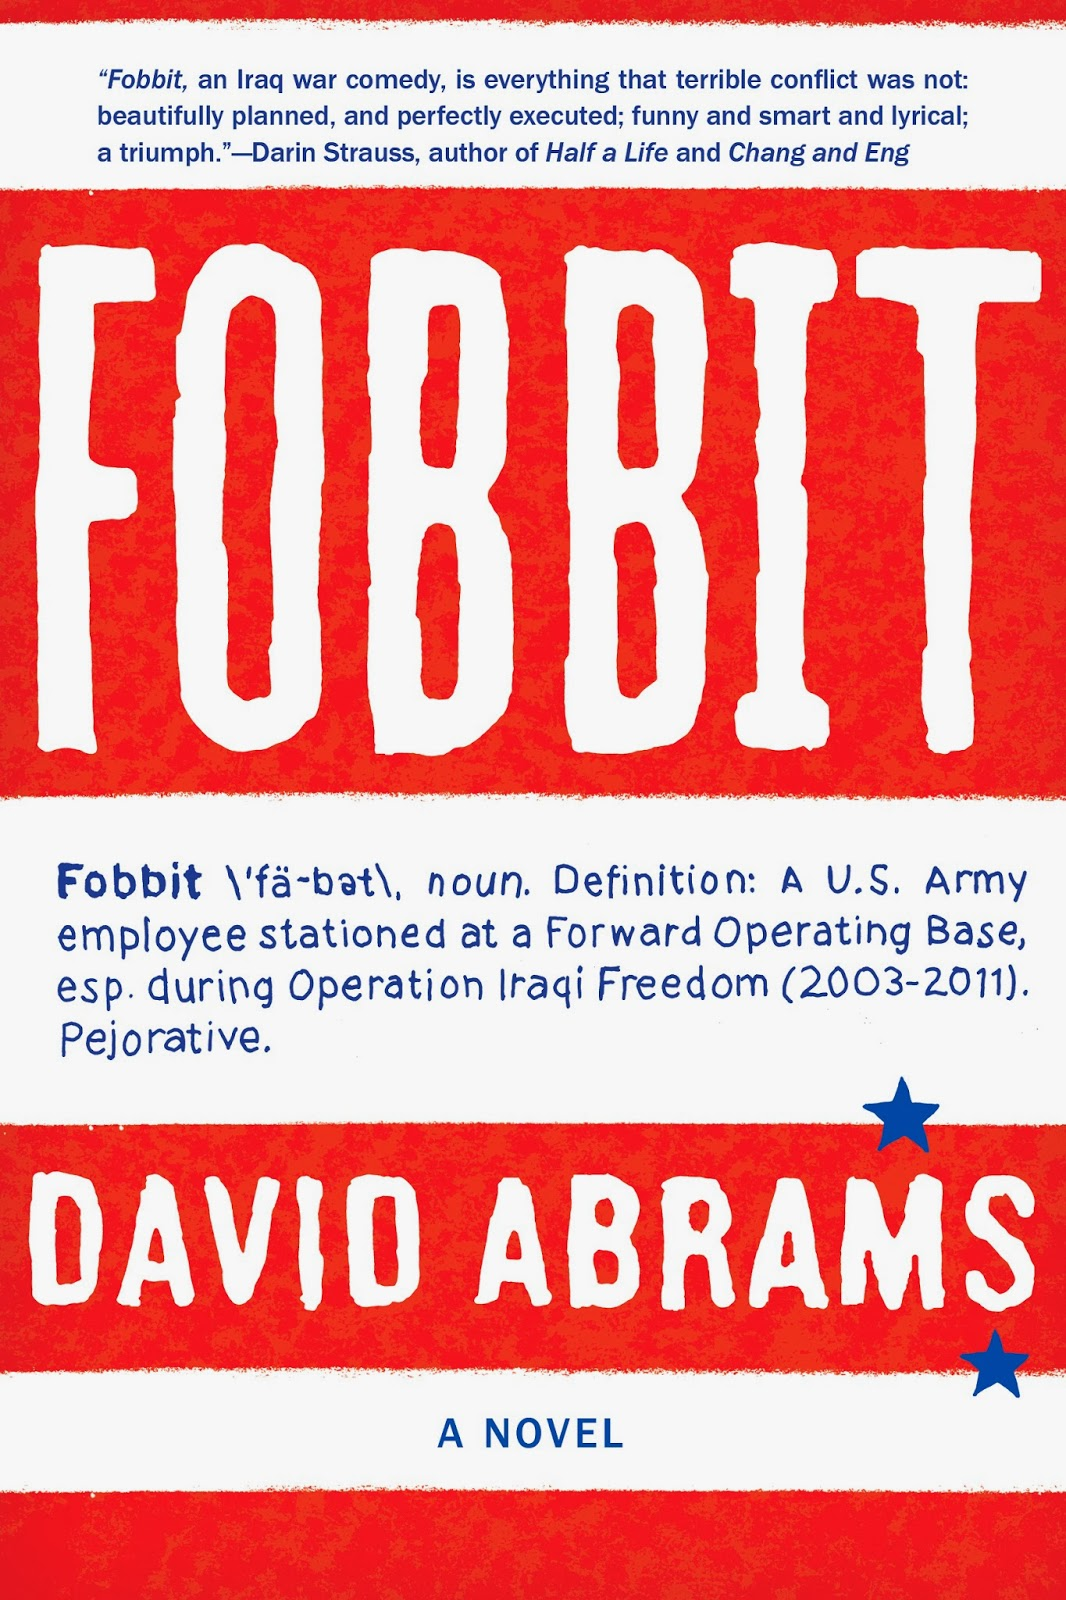 David Abrams Going Against The Grain 49 Writers Inc